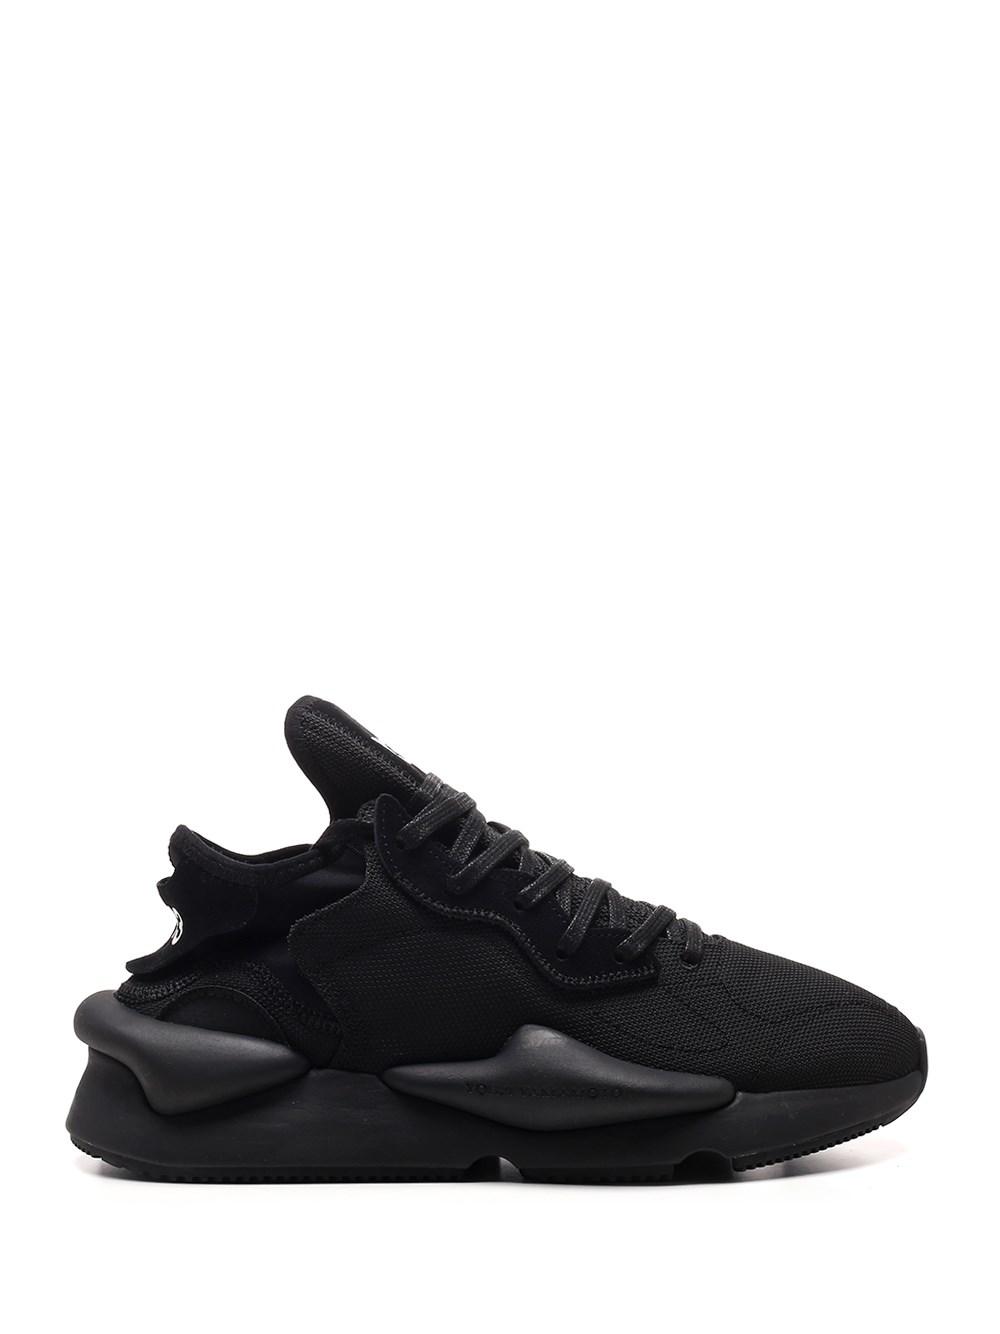 "ADIDAS Y-3 Black ""Kaiwa"" Sneaker"